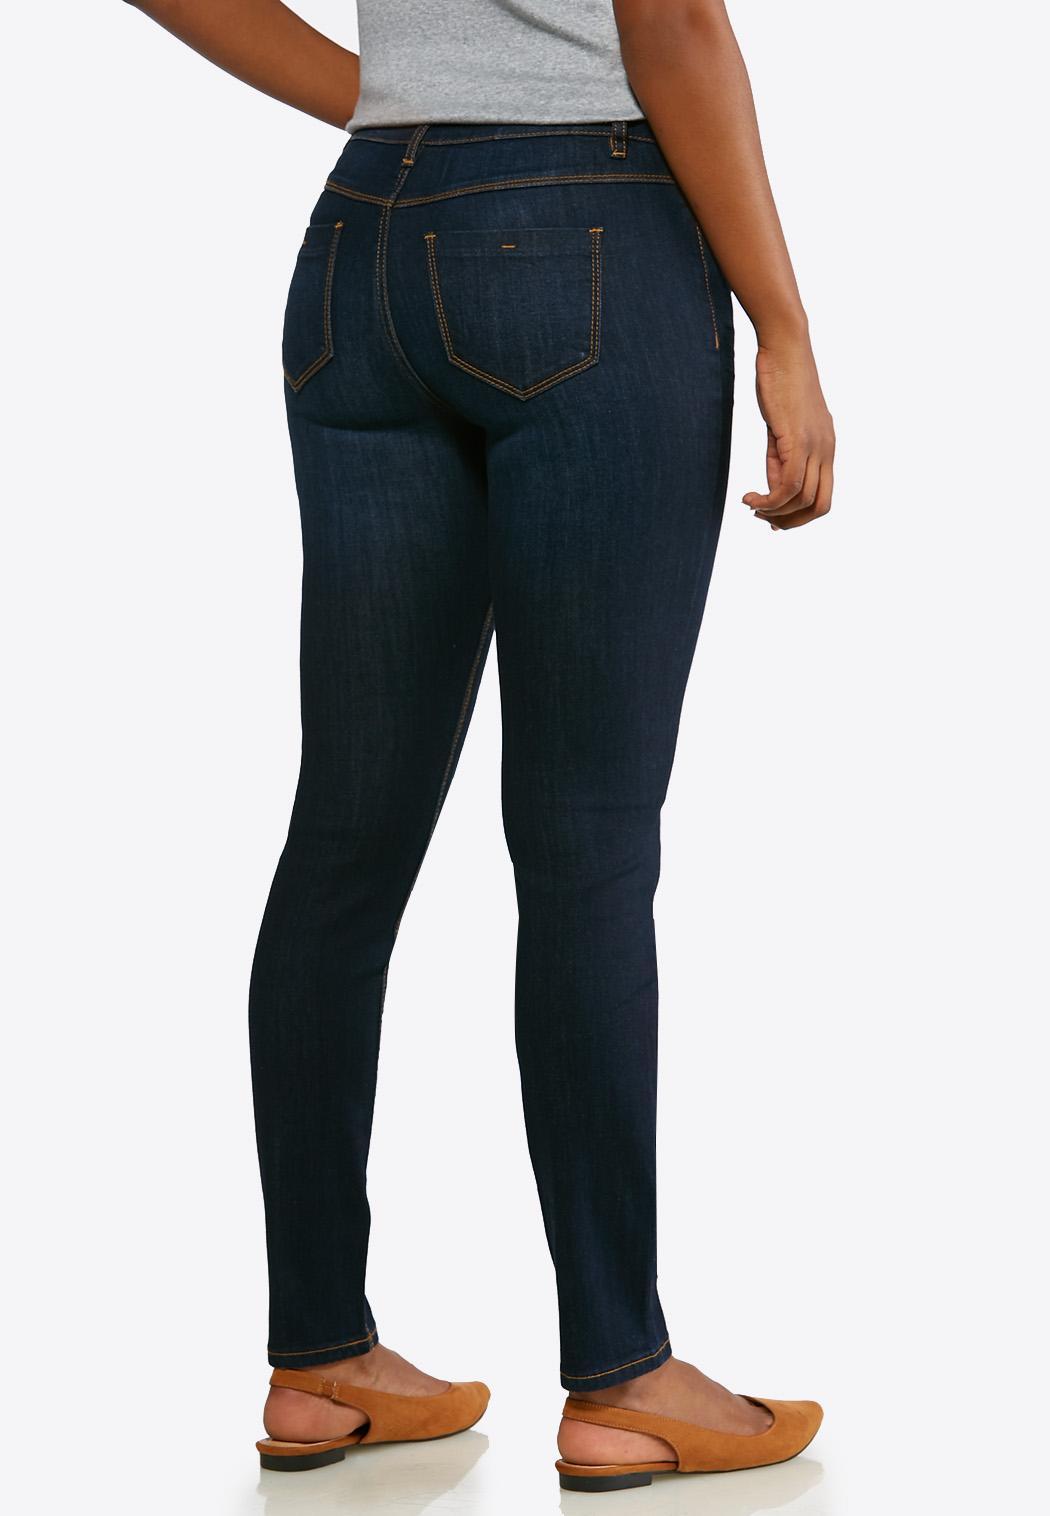 Dark Denim Jeans (Item #43664766)